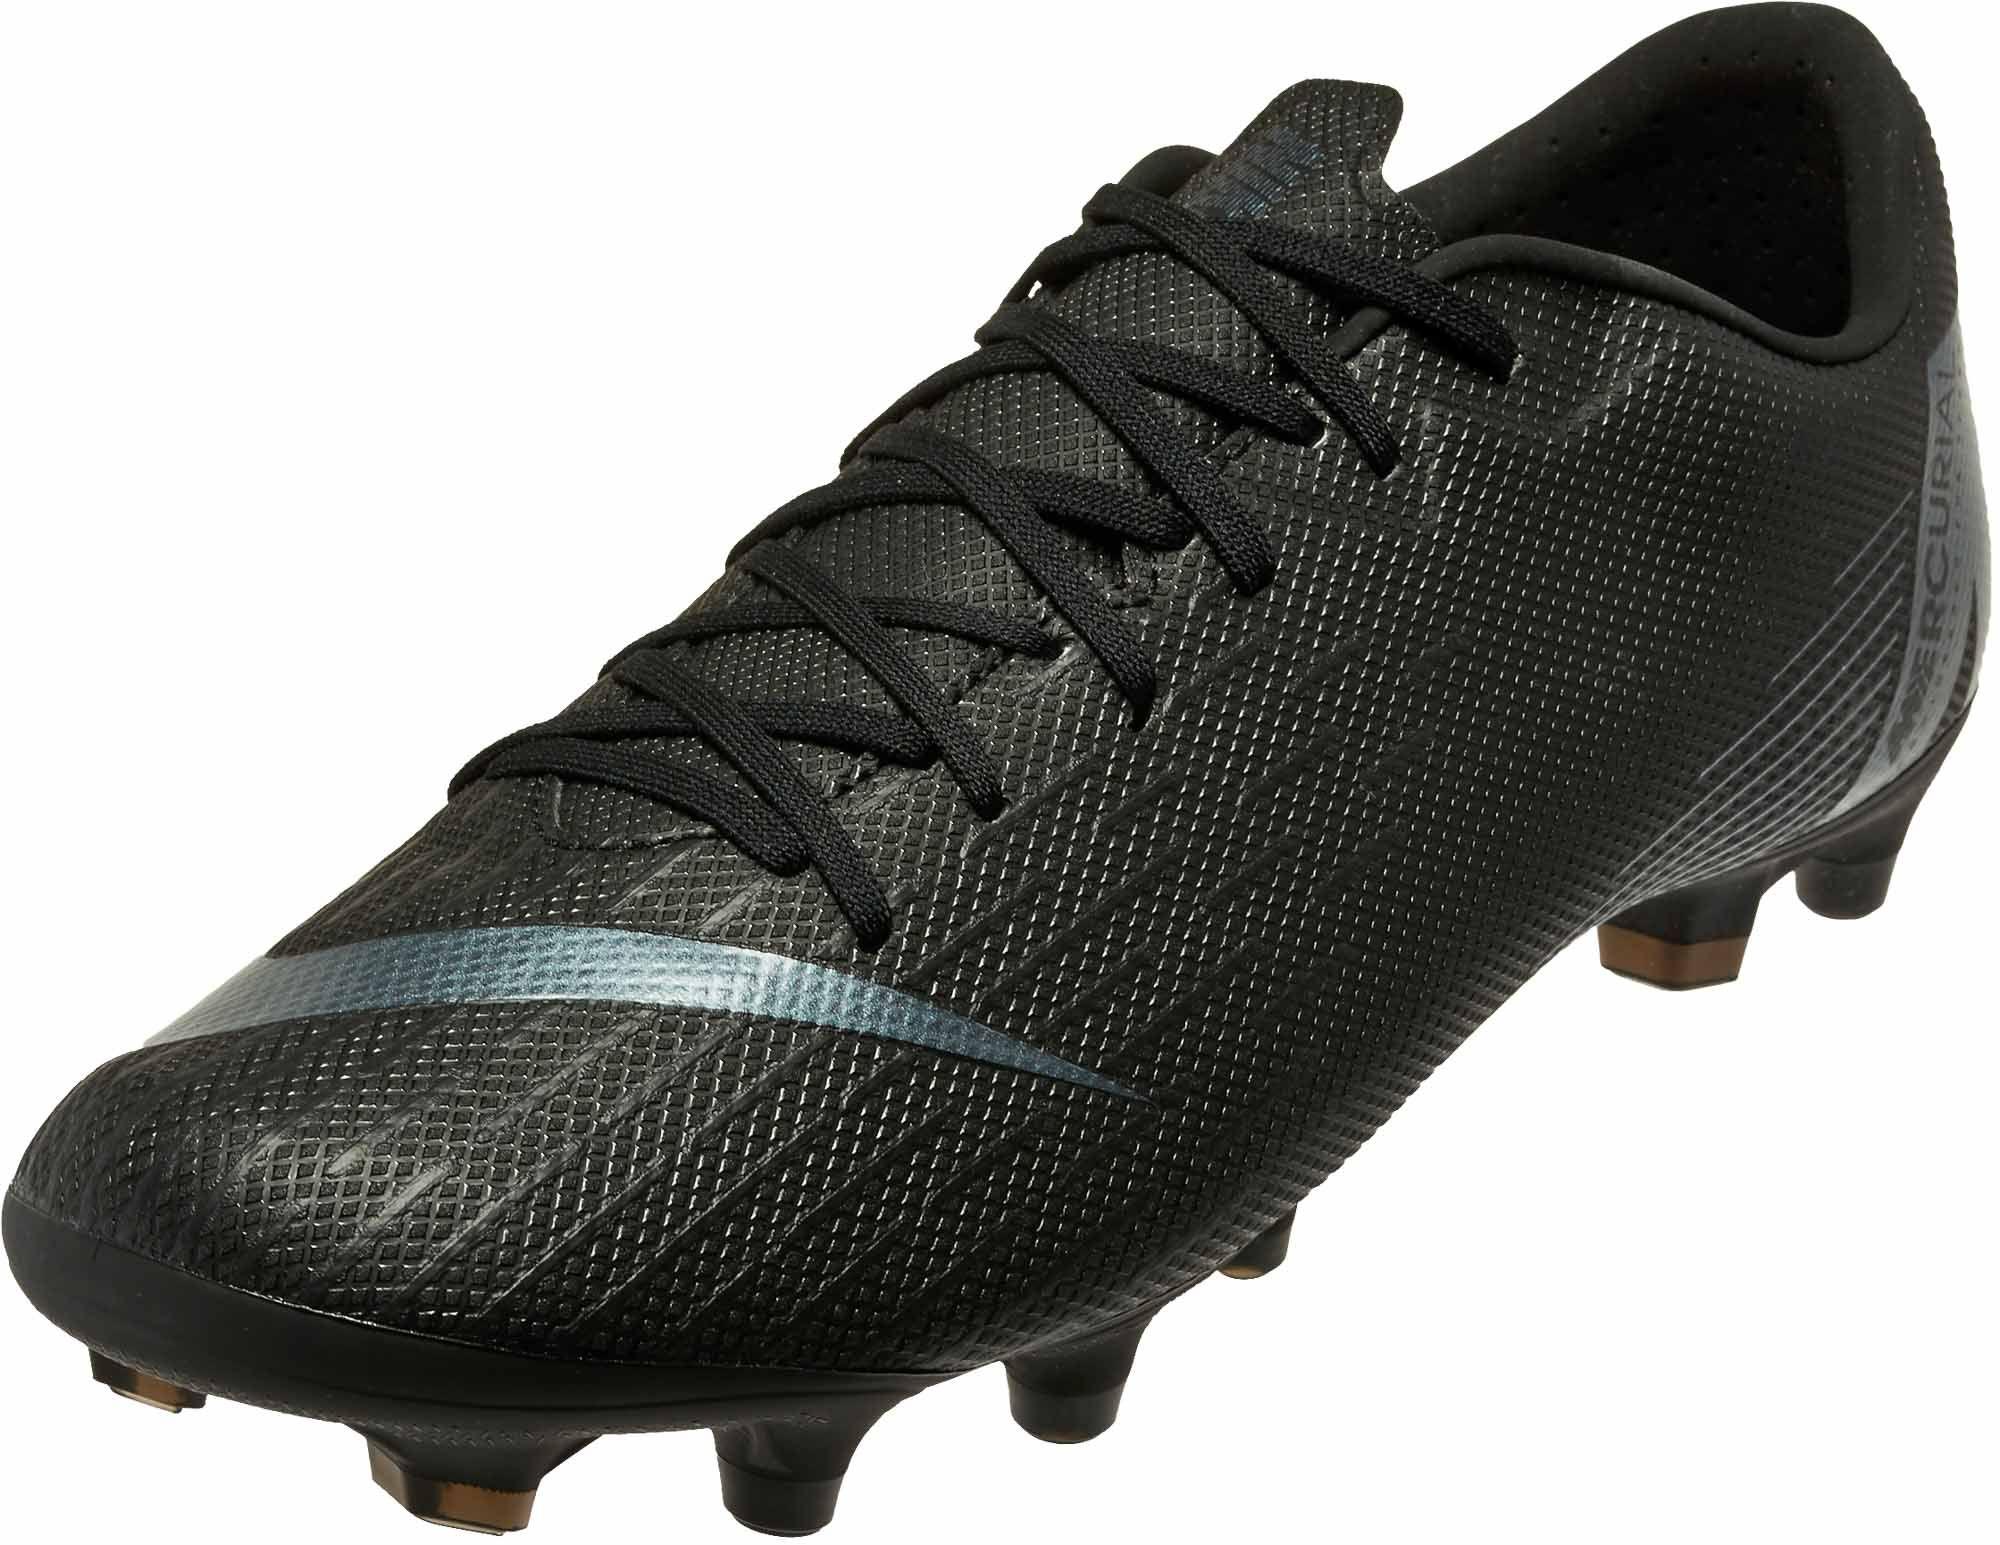 Nike Vapor 12 Academy Mg Black Black Jersey Atletico Madrid Atletico Madrid Jersey Bayern Munich